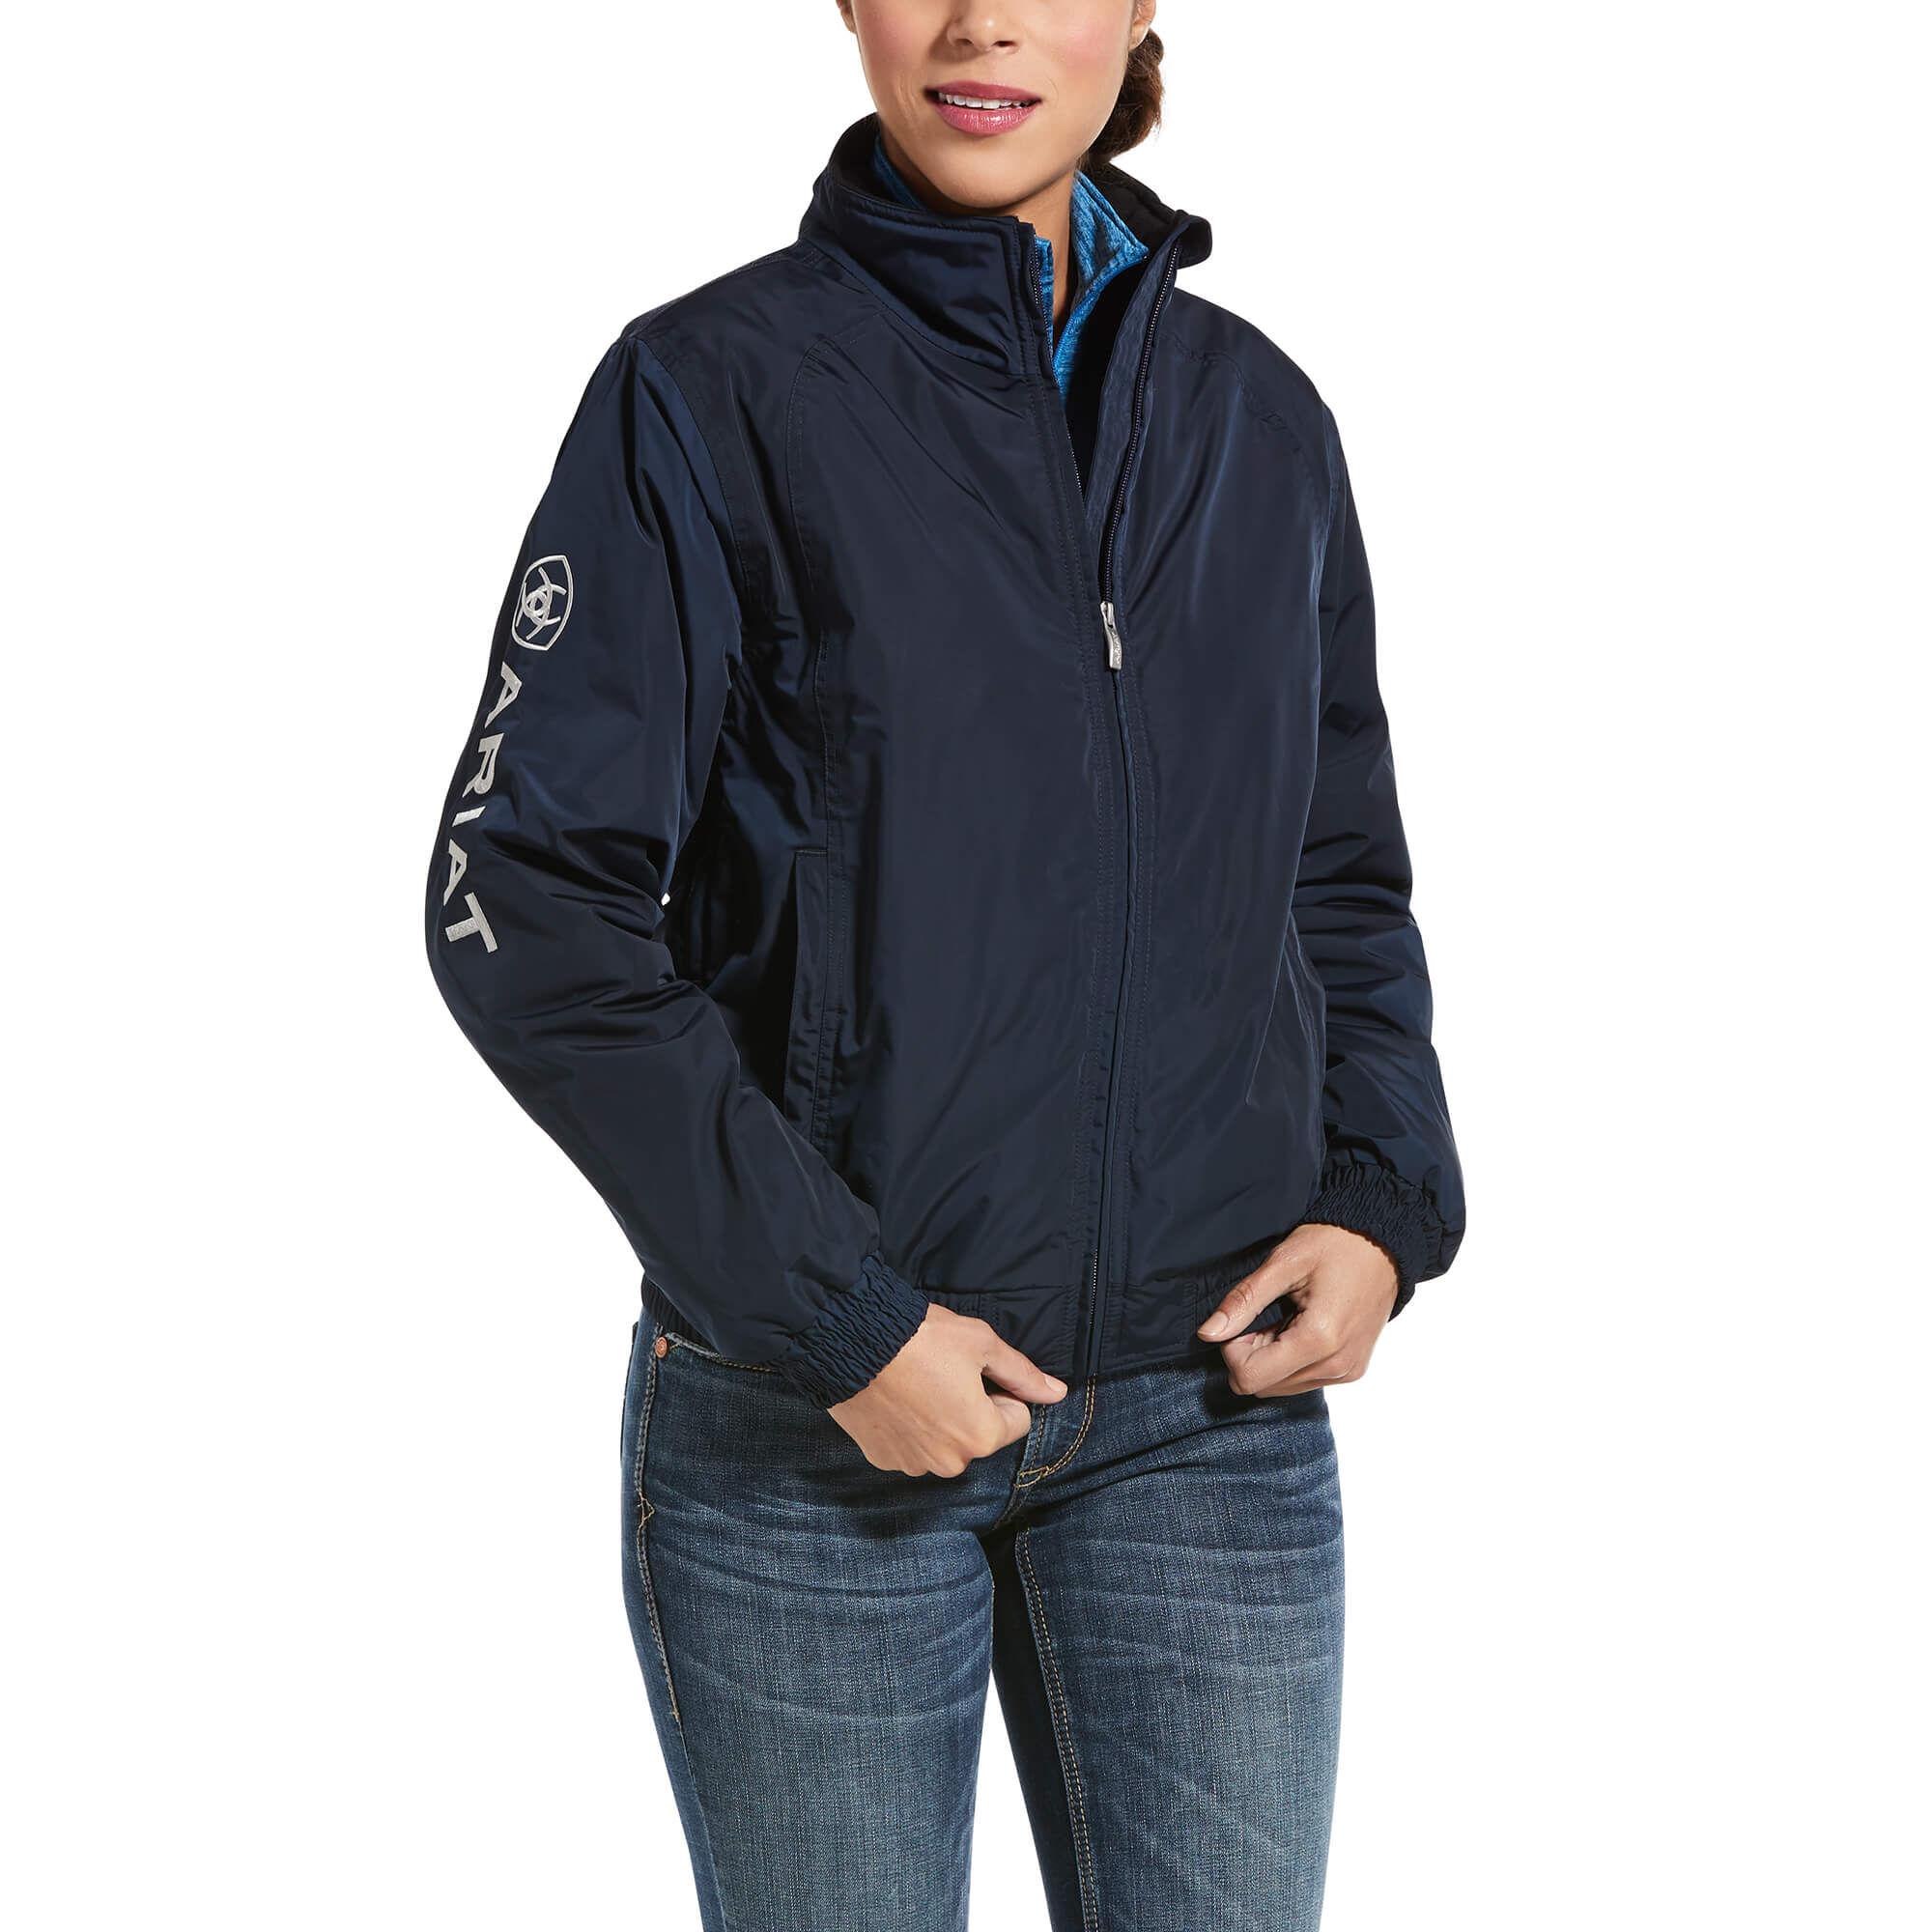 10001712//3 Ariat stable veste équipe Femme